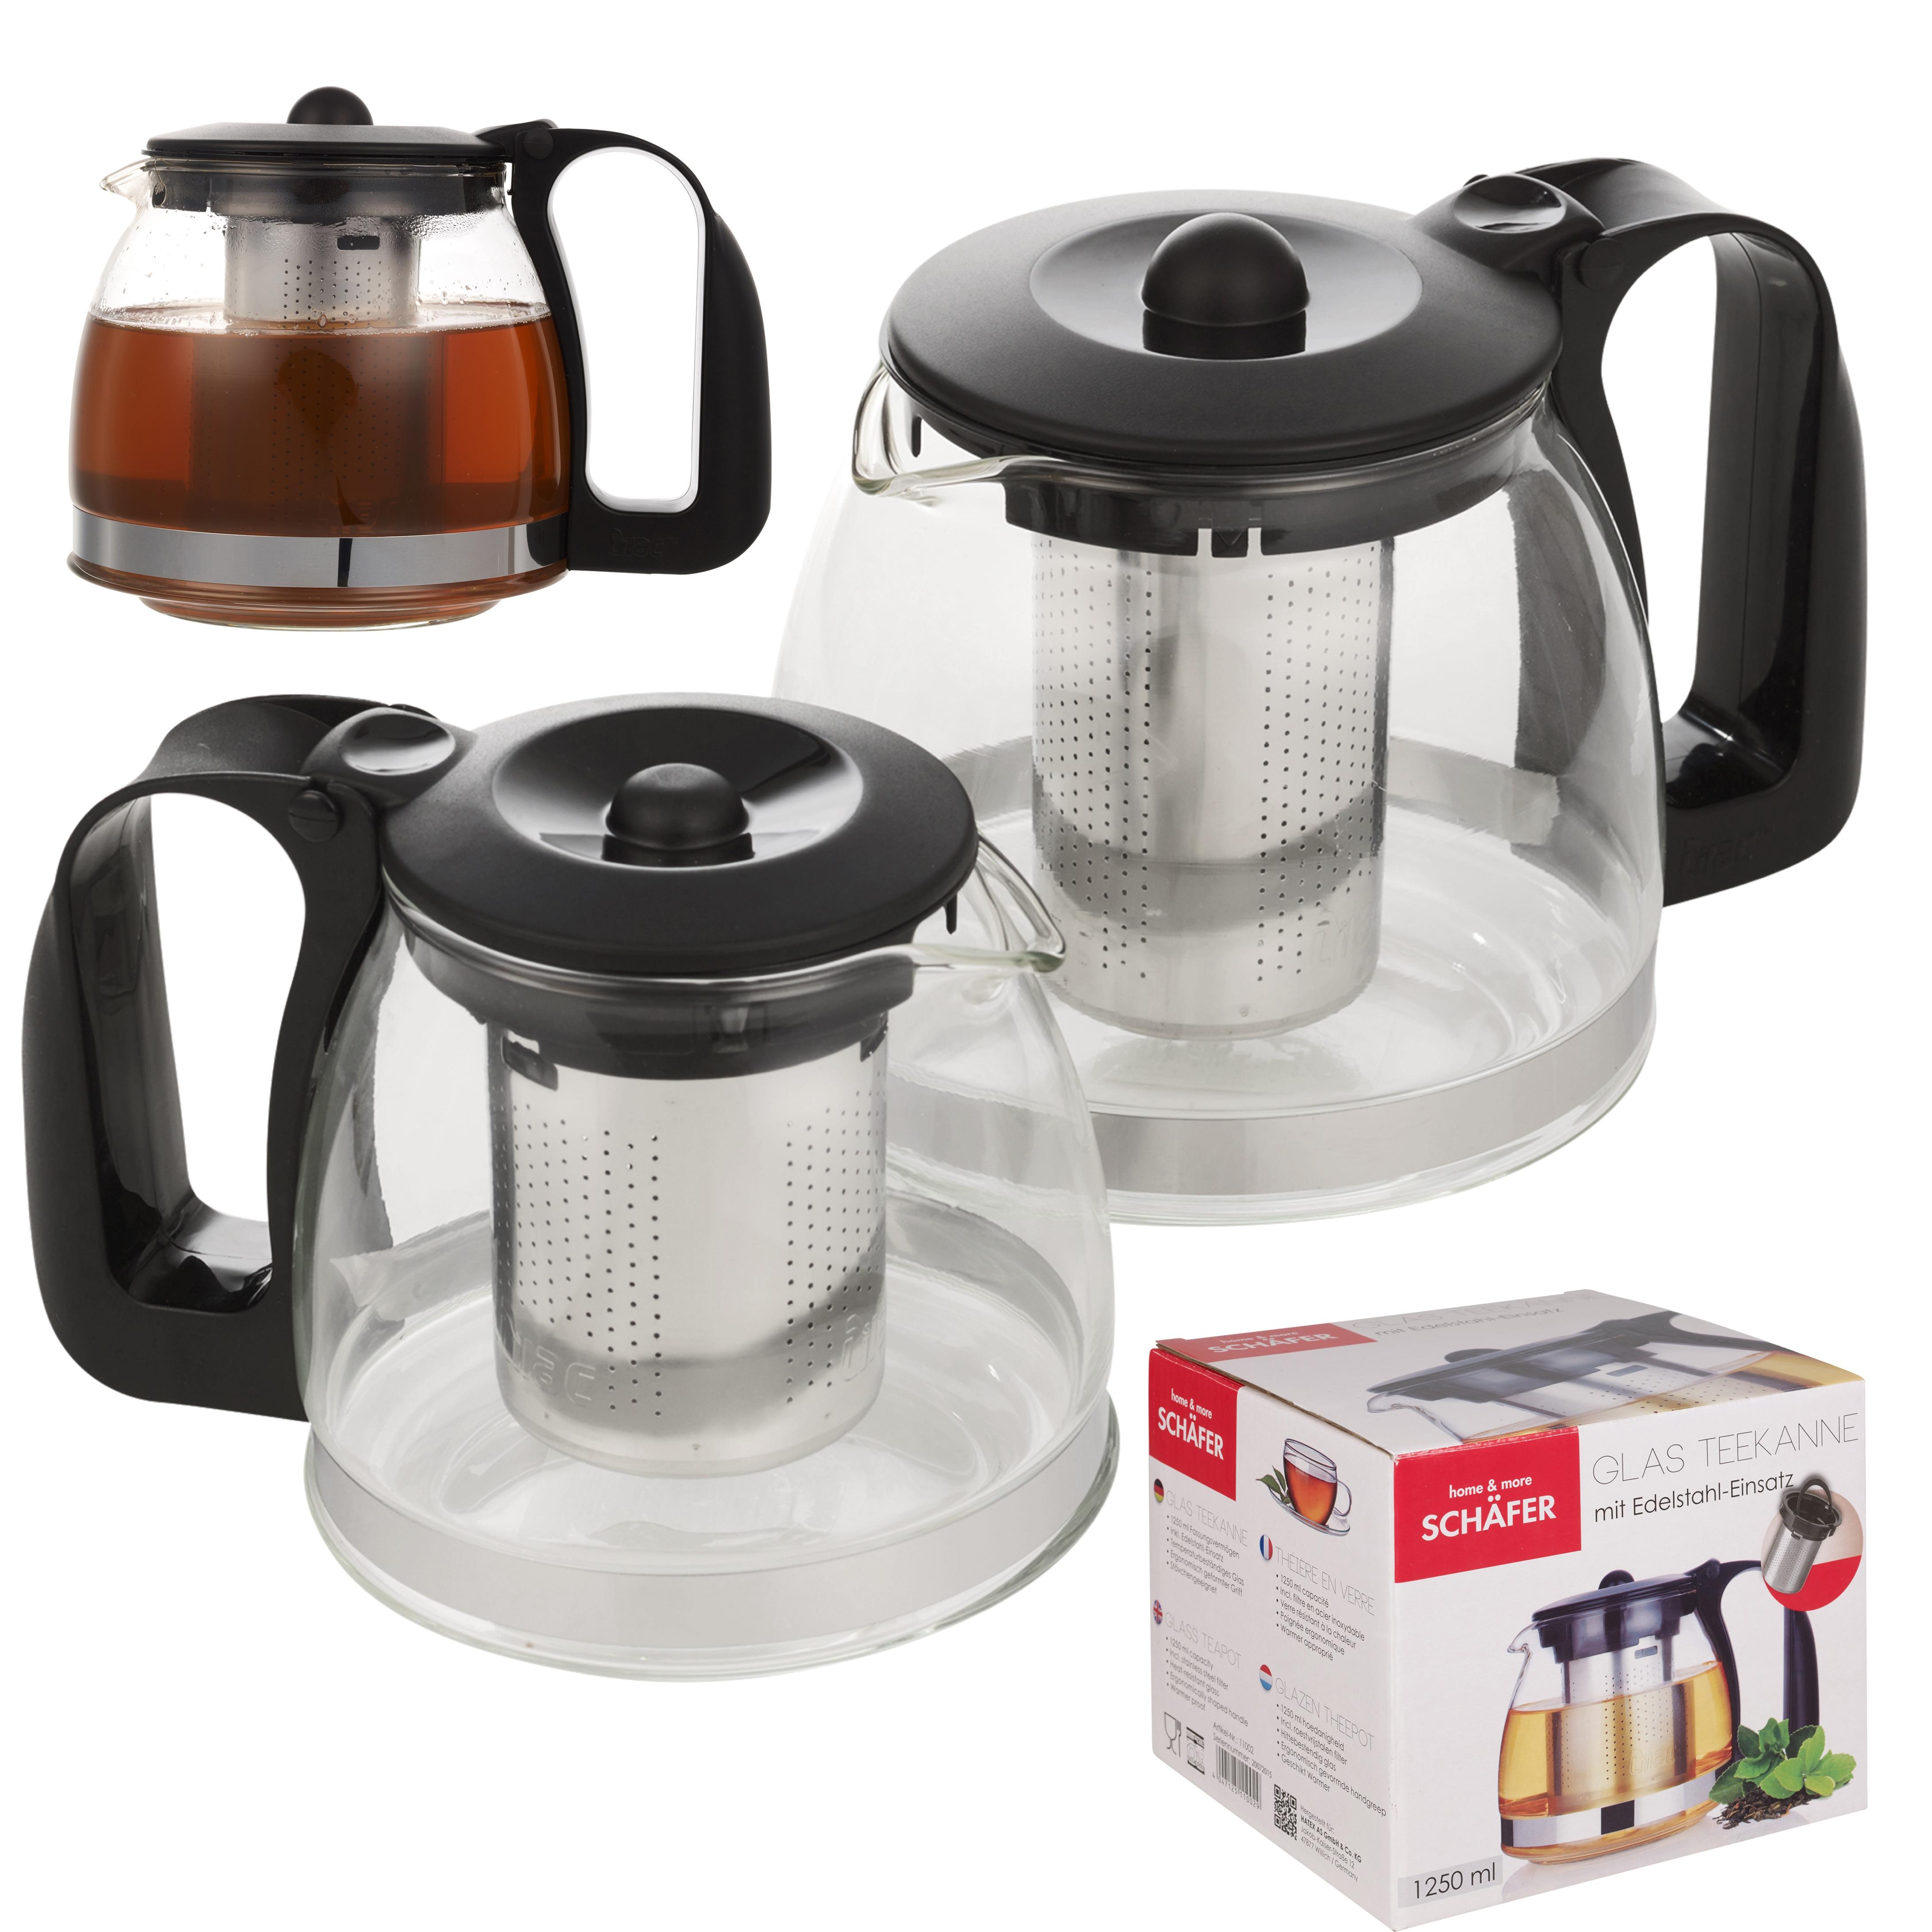 Schäfer glass tea pot borosilicate heat resistant jug